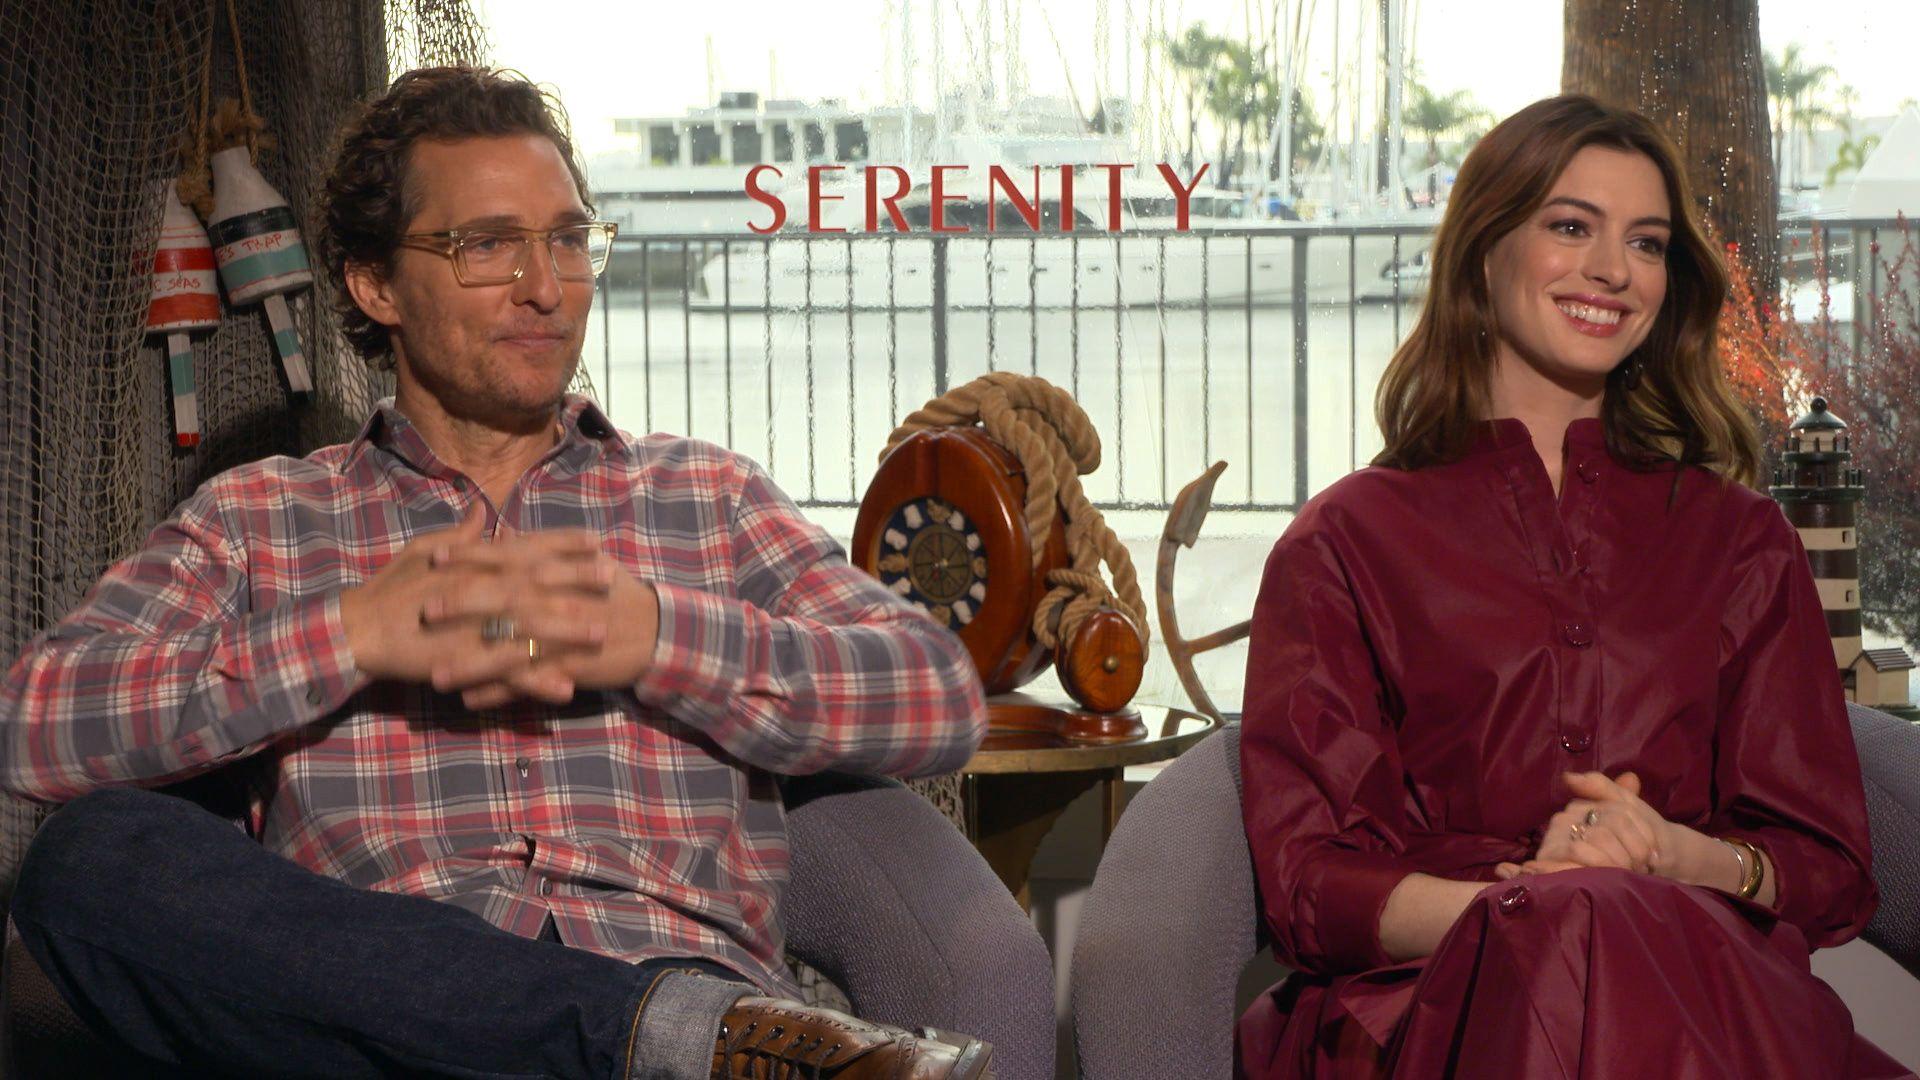 'Serenity': Matthew McConaughey and Anne Hathaway on Their Twisty Thriller